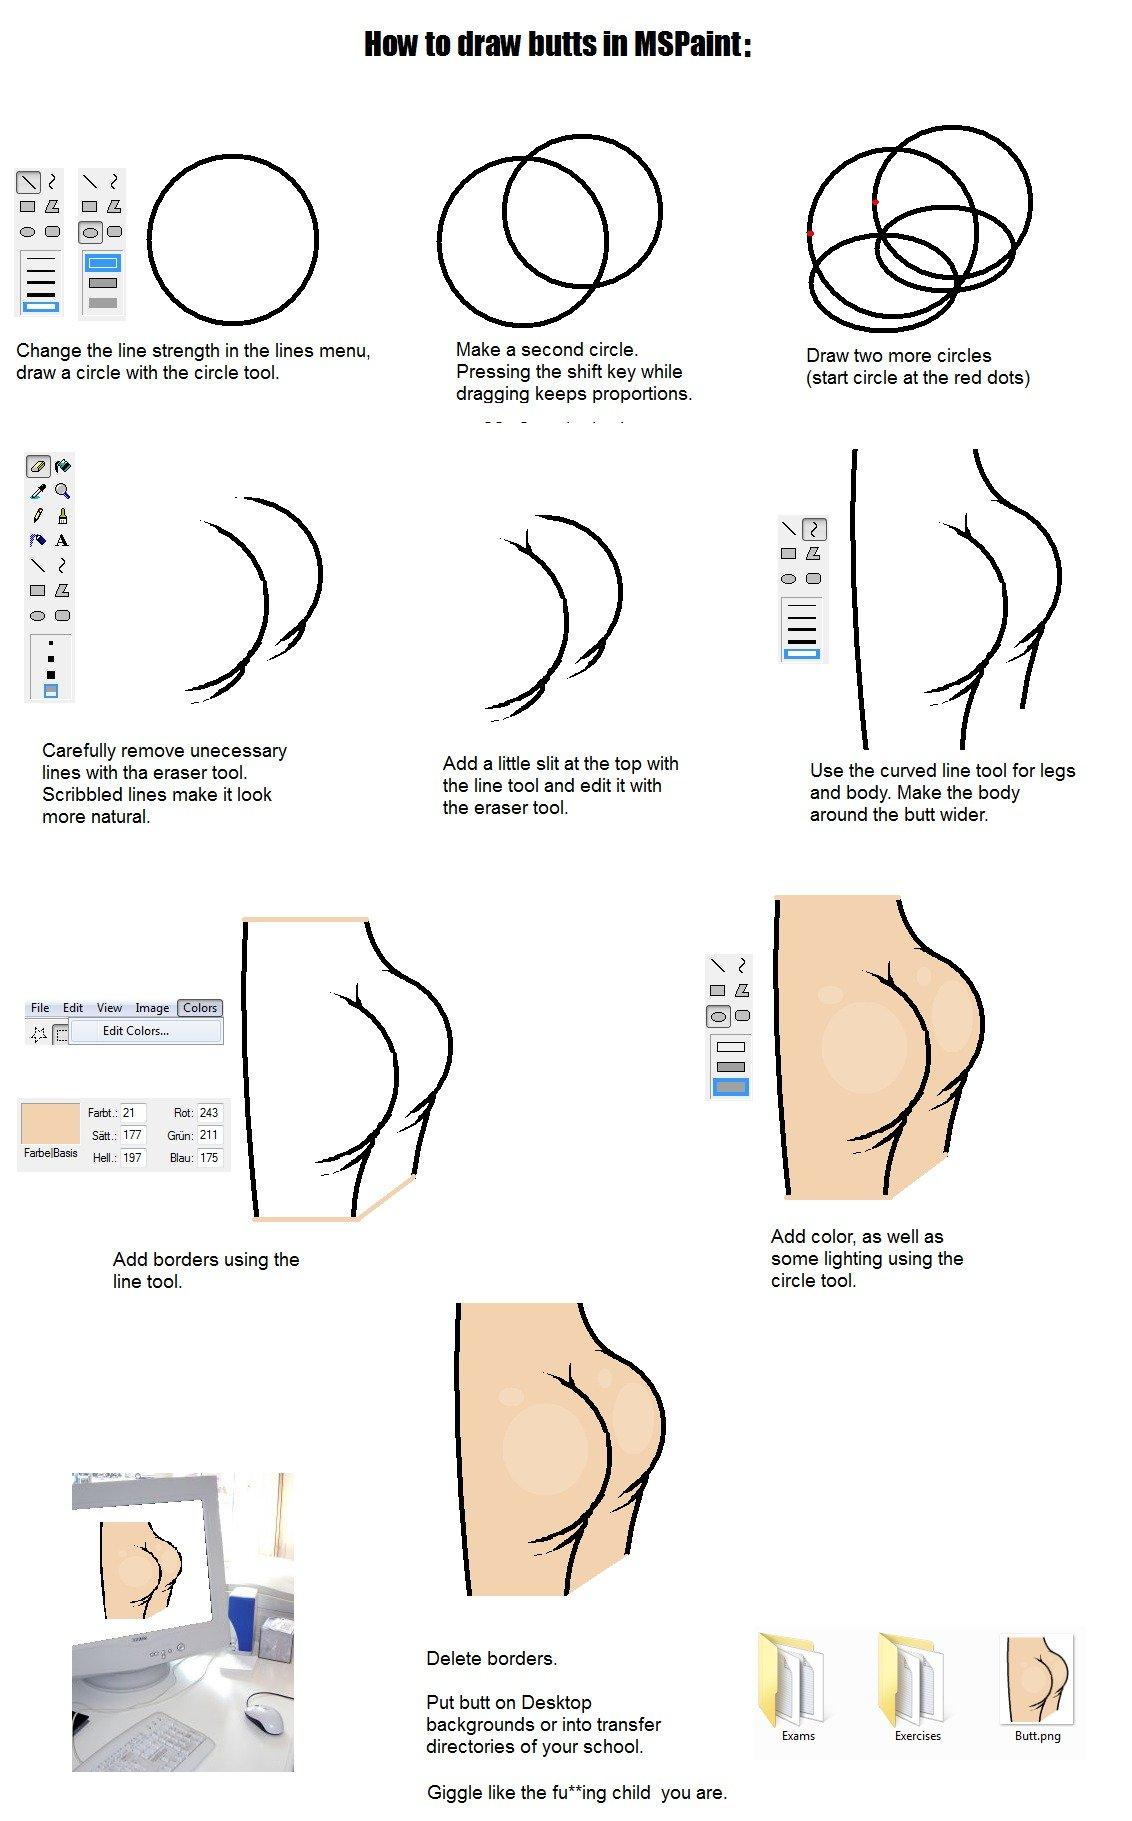 Drawing Lines Using Arrow Keys Java : Draw butts in mspaint